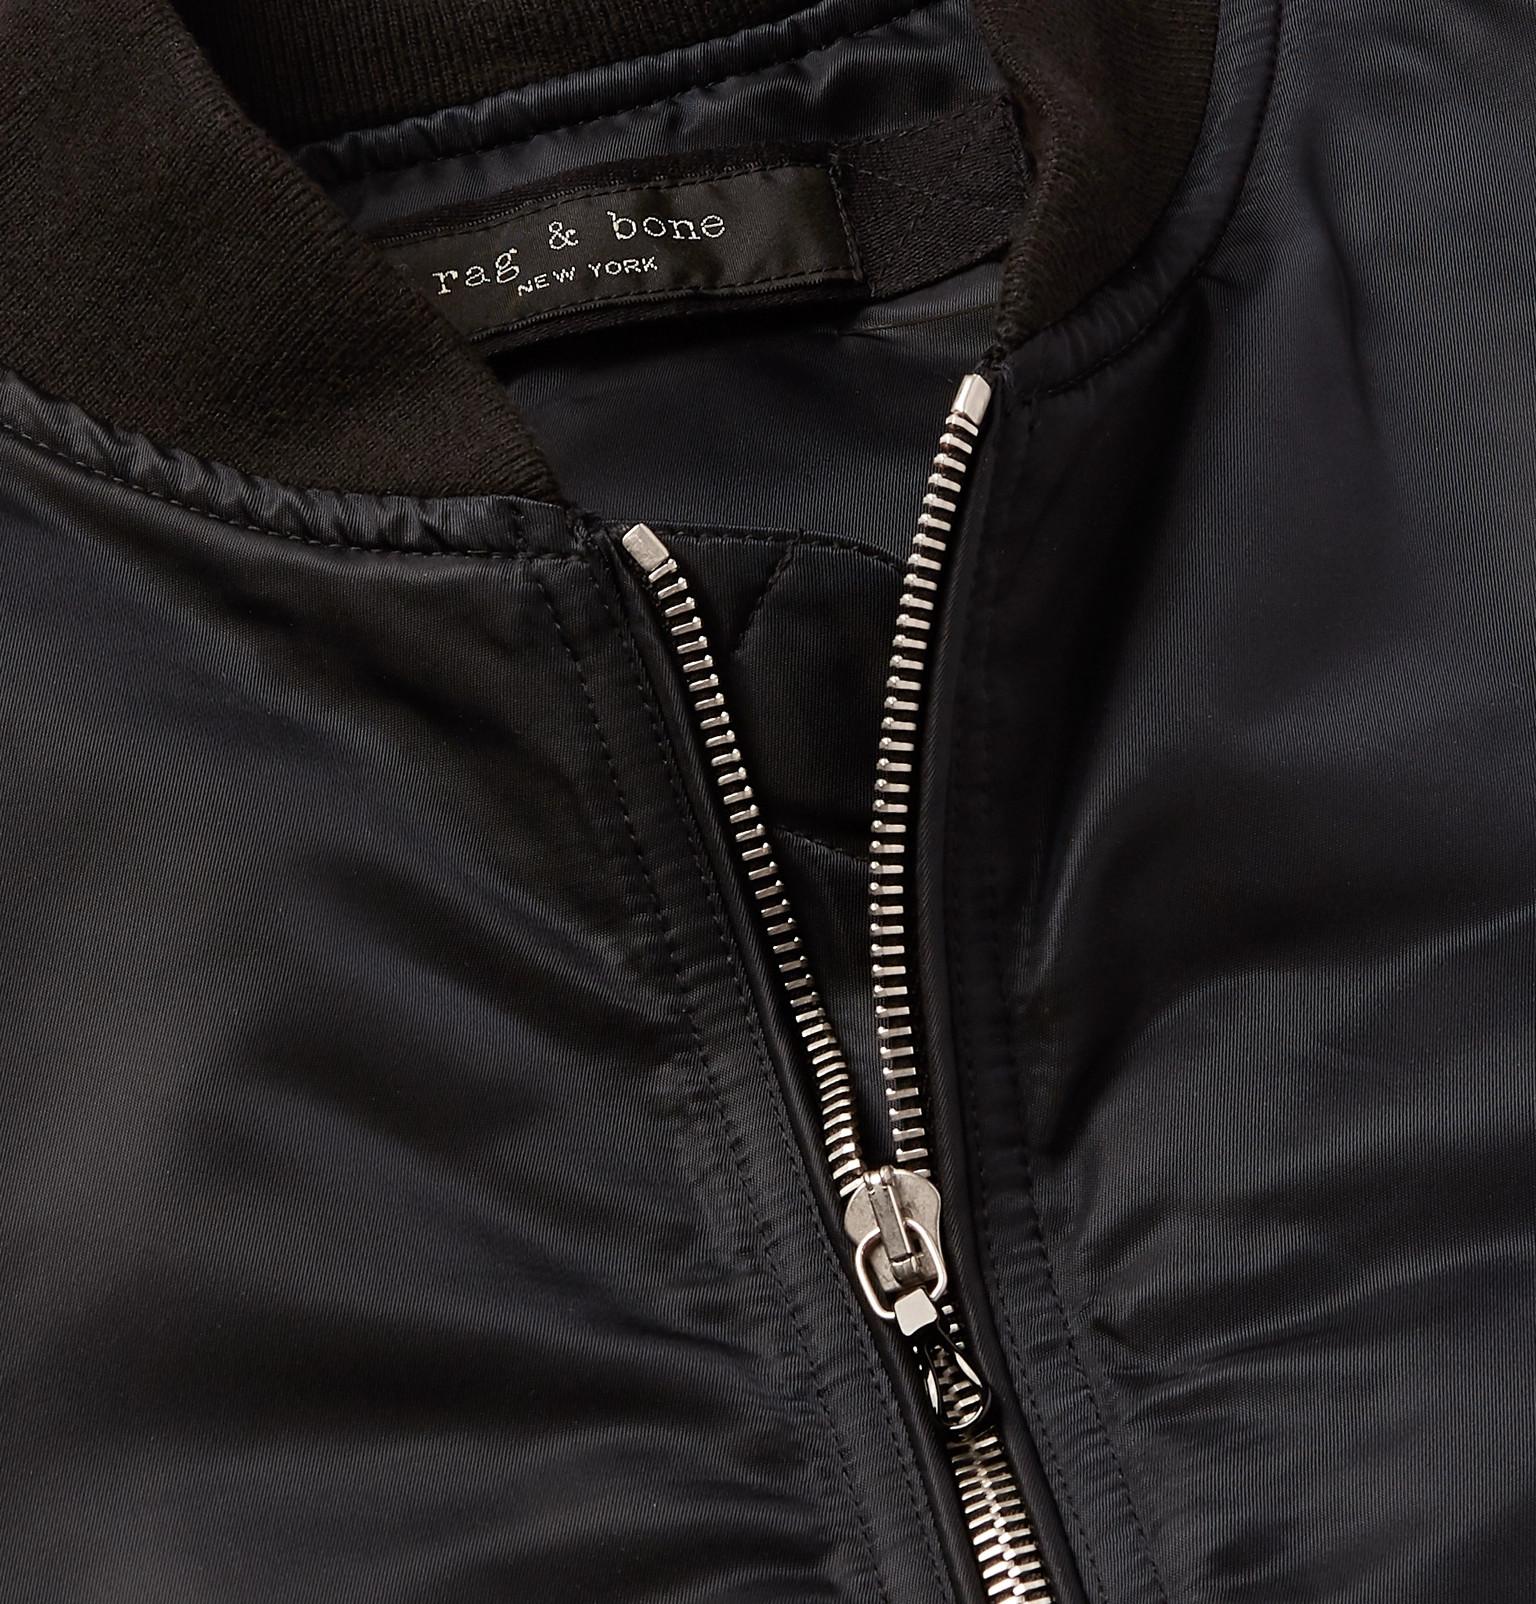 ba5ee3618 rag & bone - Manston Nylon Bomber Jacket